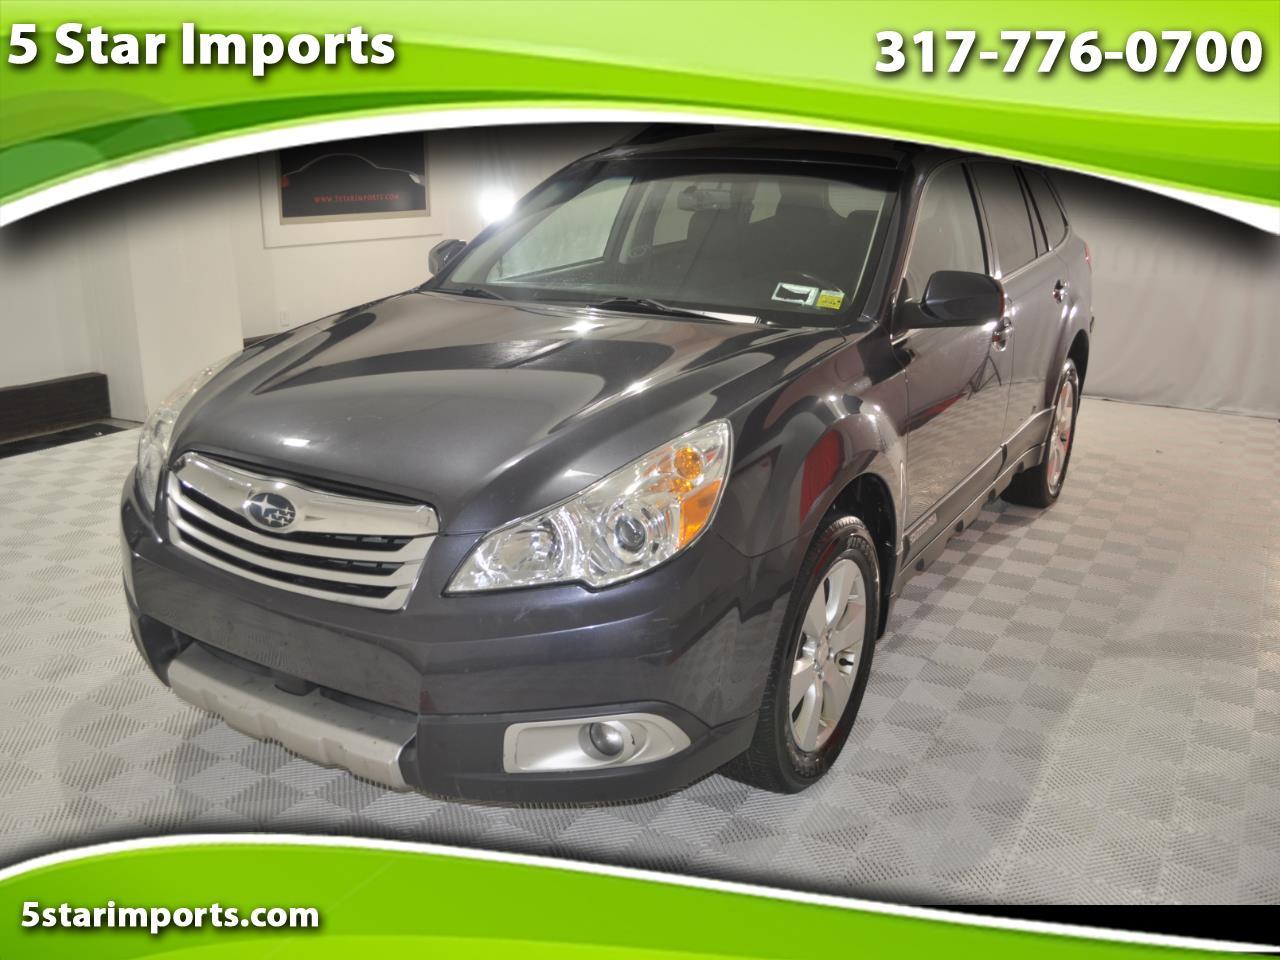 Subaru Outback 2.5i Premium 2010